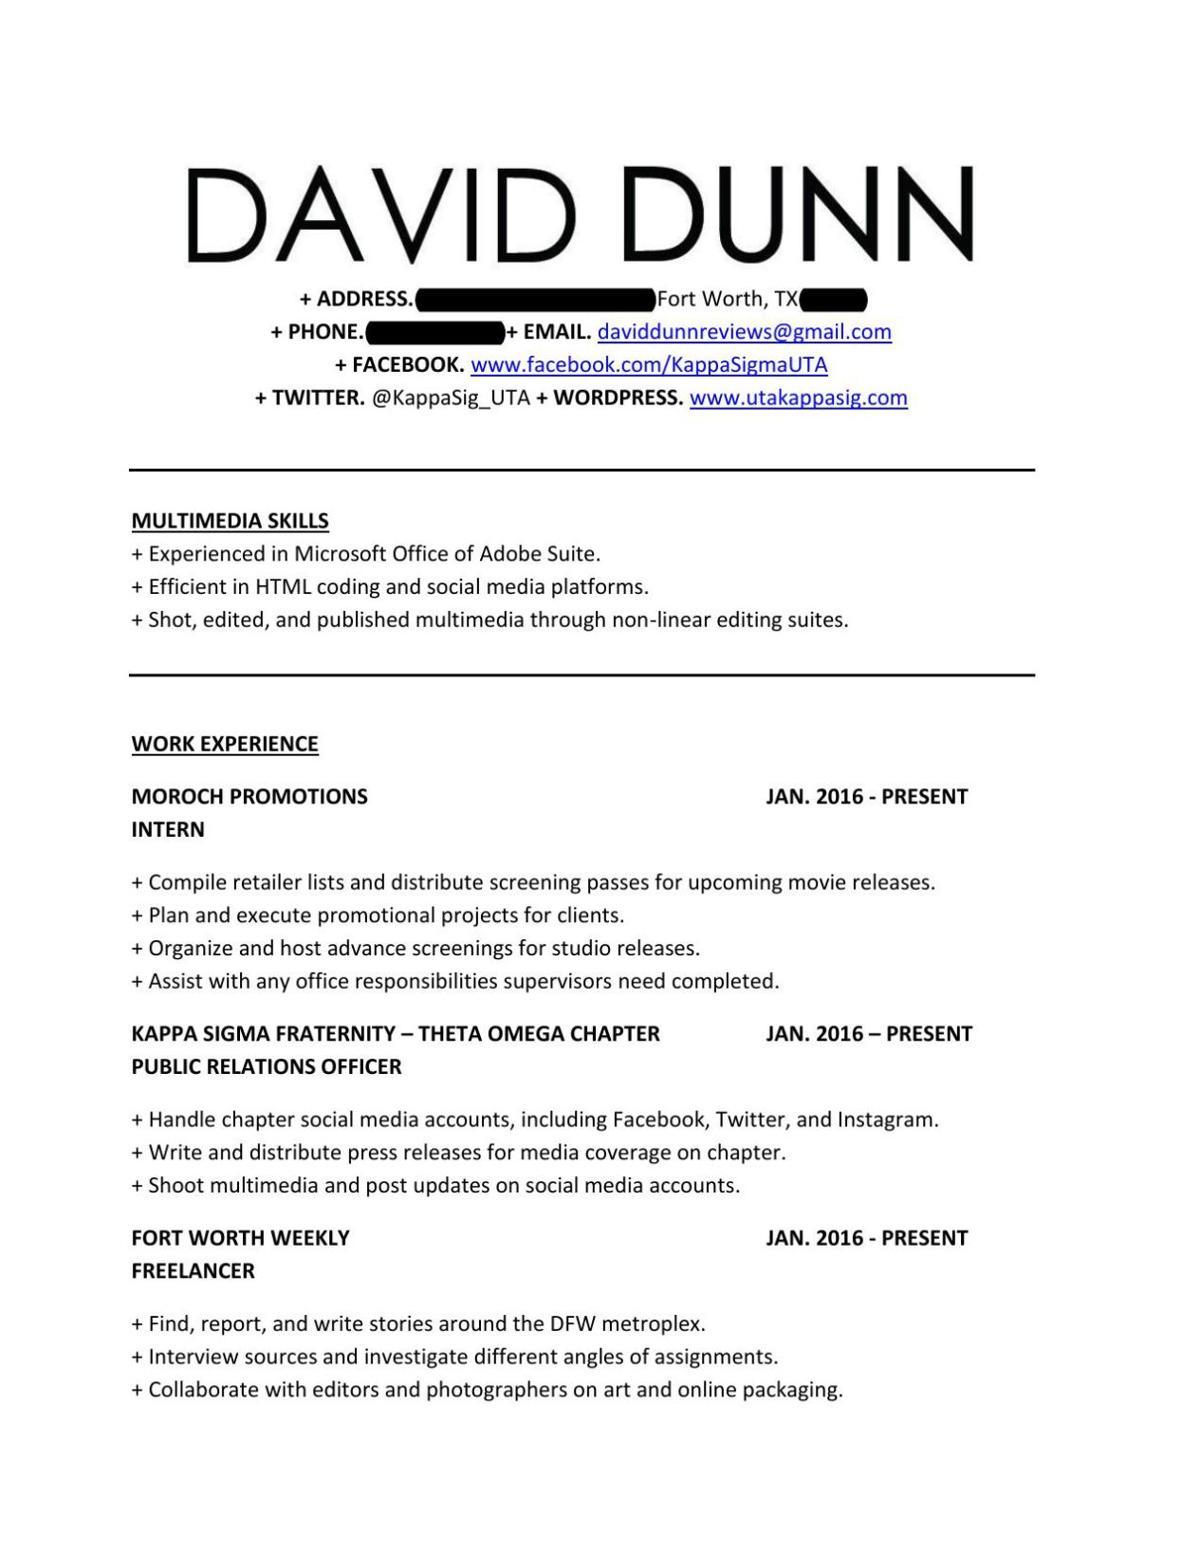 David Dunn's Resume